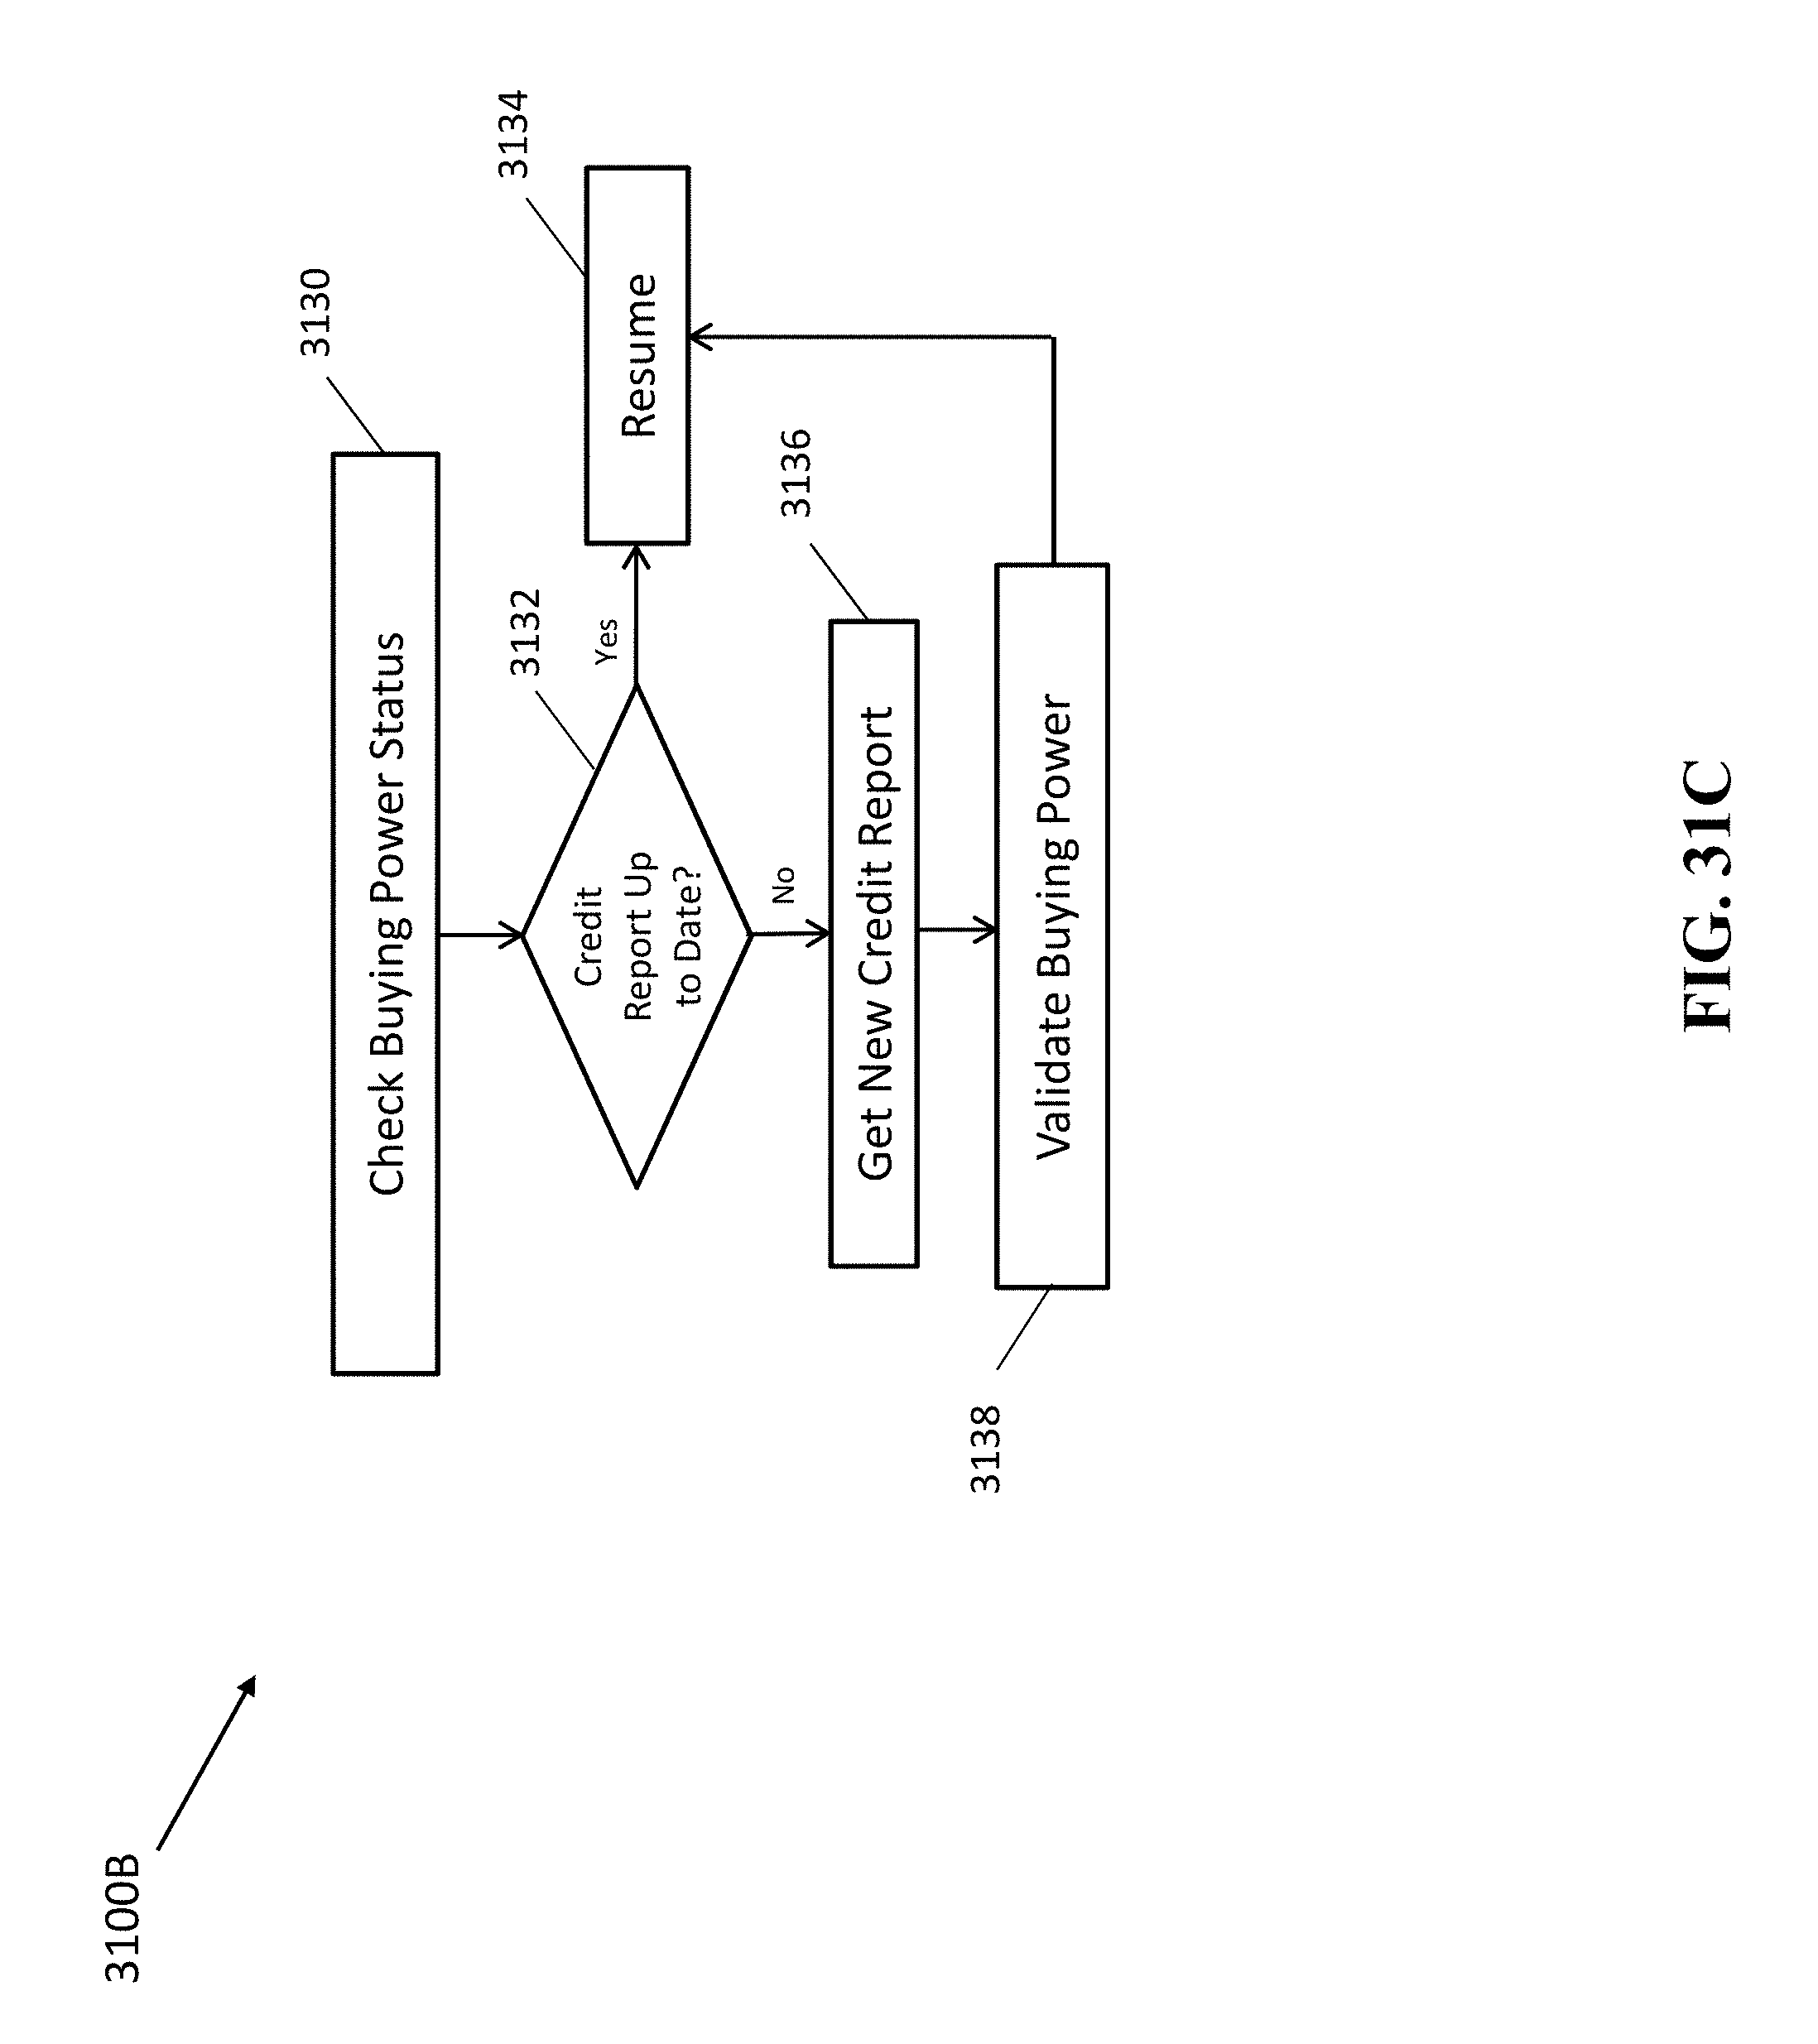 variable strobe light circuit diagram tradeoficcom wiring diagram soe rh 14 ybscx eindruckhochzwei de